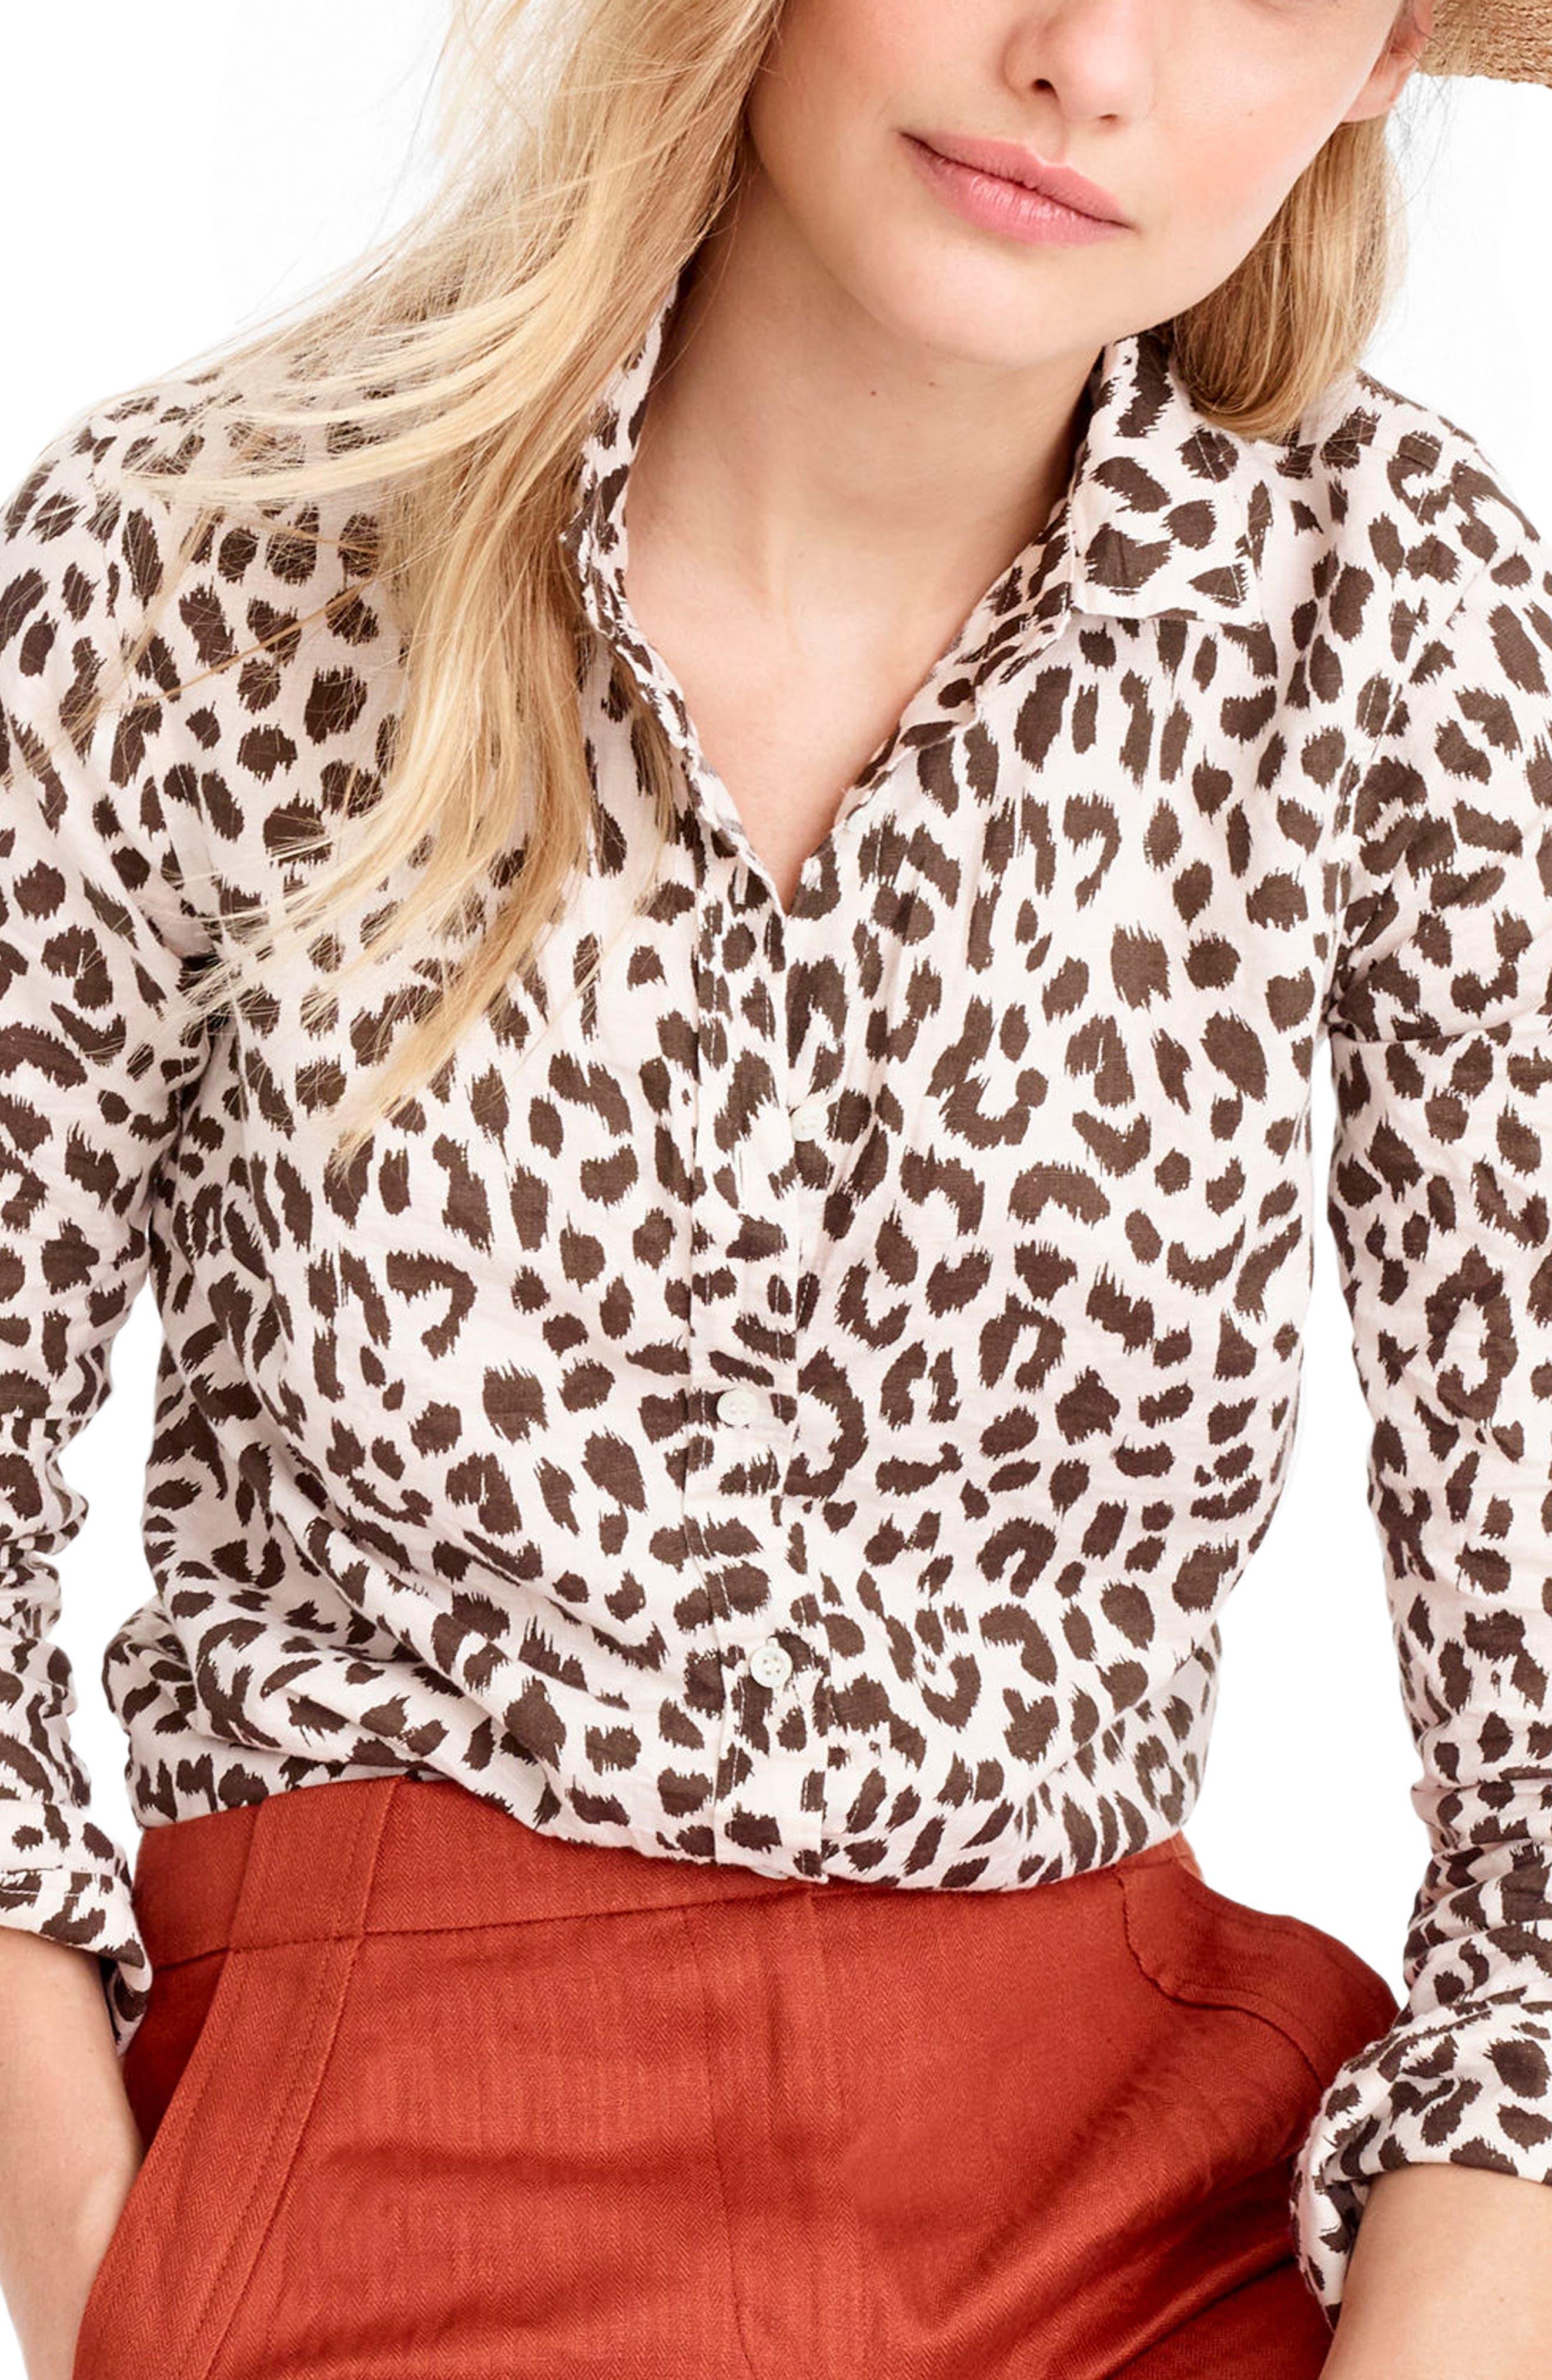 Alternate Image 1 Selected - J.Crew Perfect Leopard Print Linen & Coton Shirt